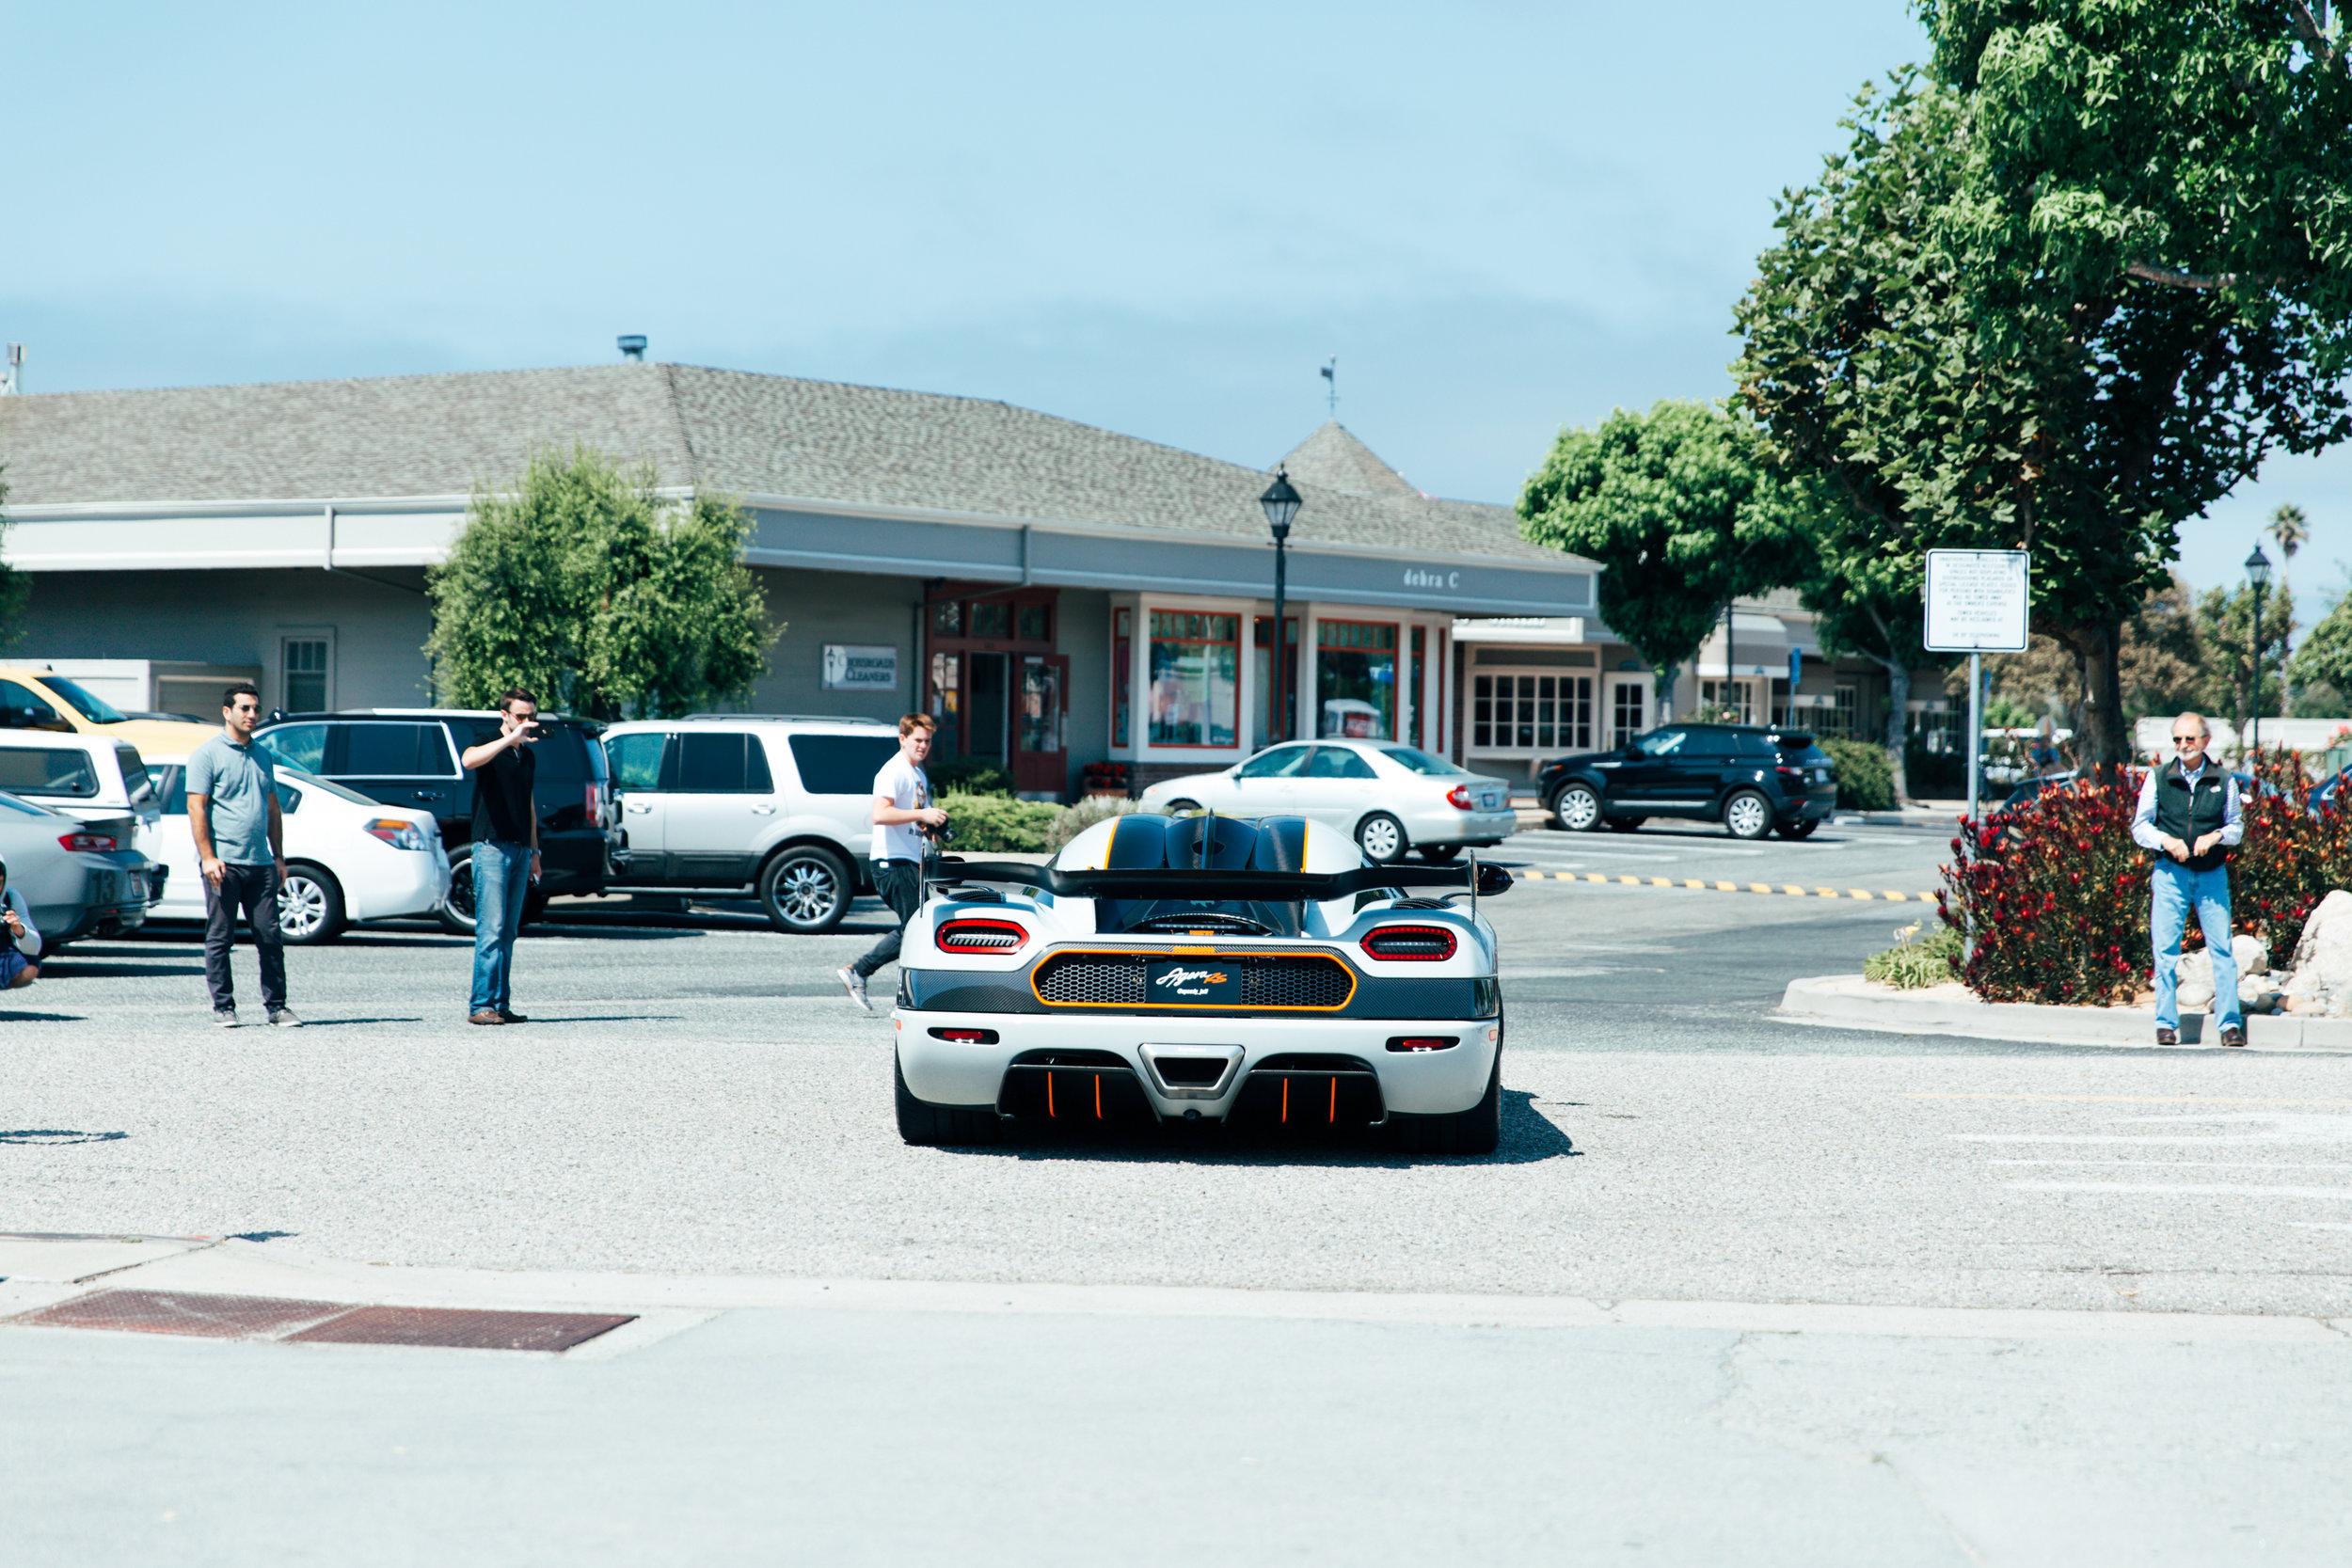 Stay_Driven_Monterey_Car_Week_Koenigsegg-69.jpg